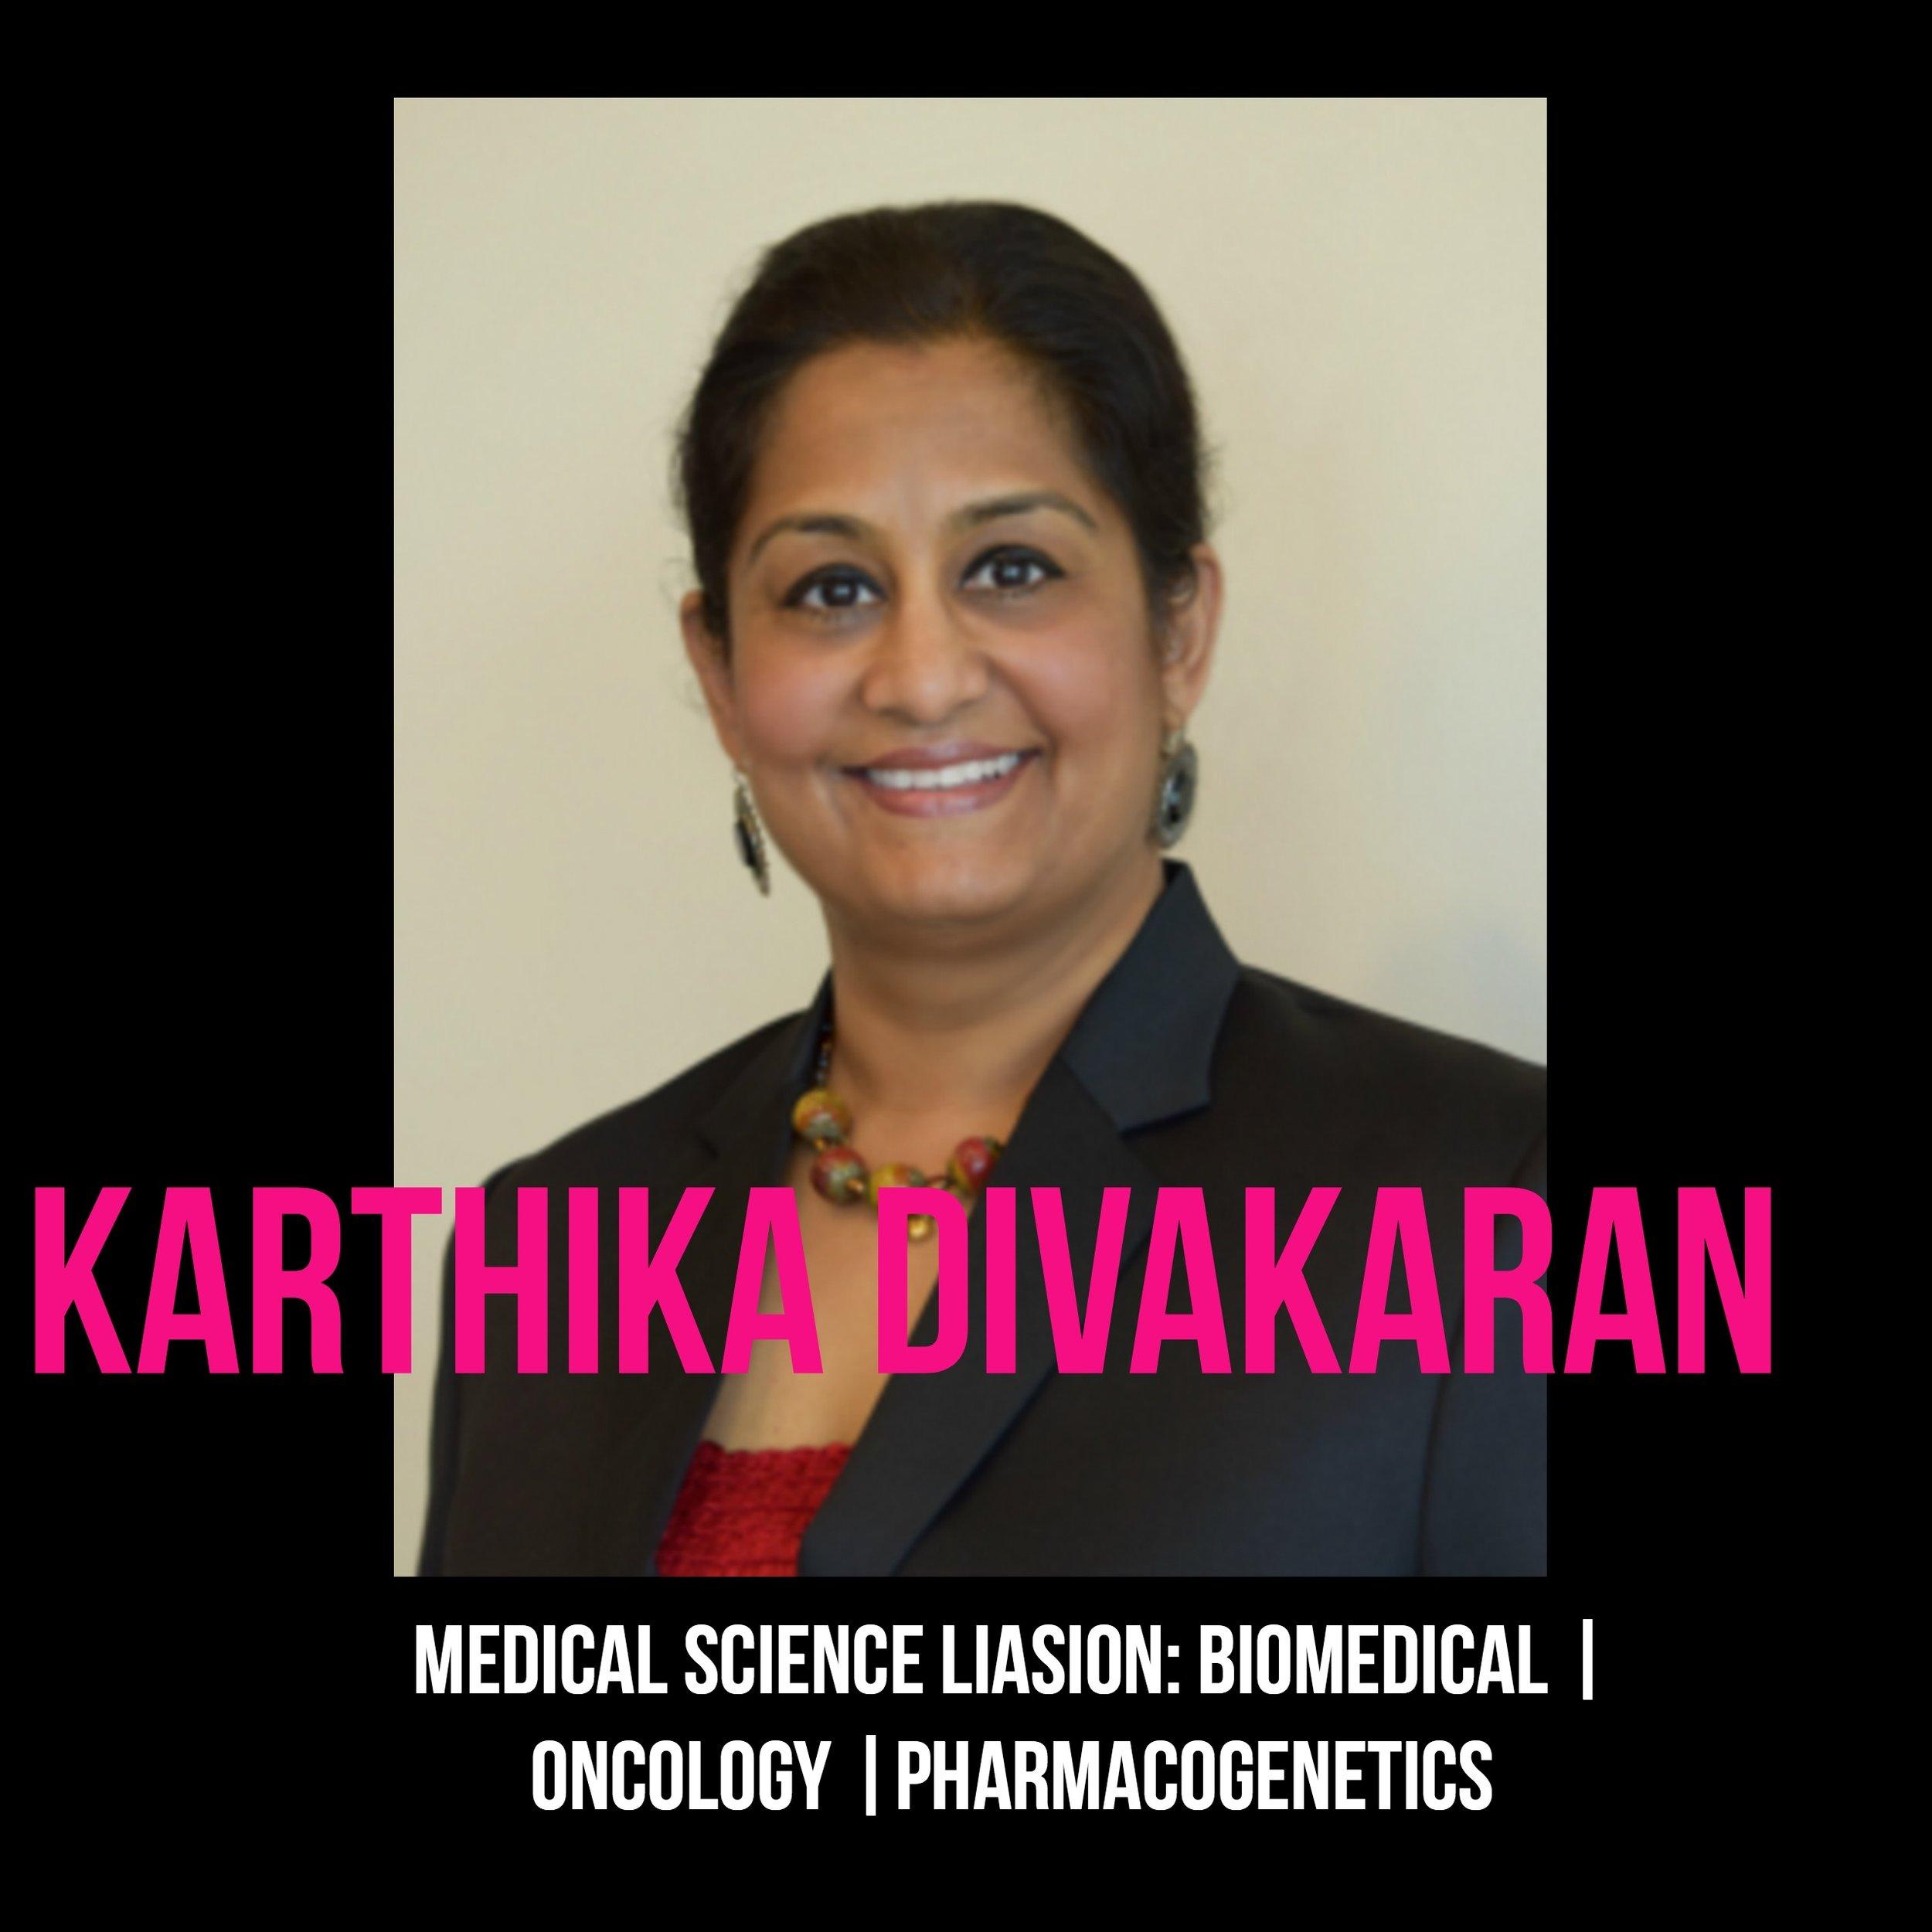 THE JILLS OF ALL TRADES™ Karthika Divakaran Medical Science Liaison